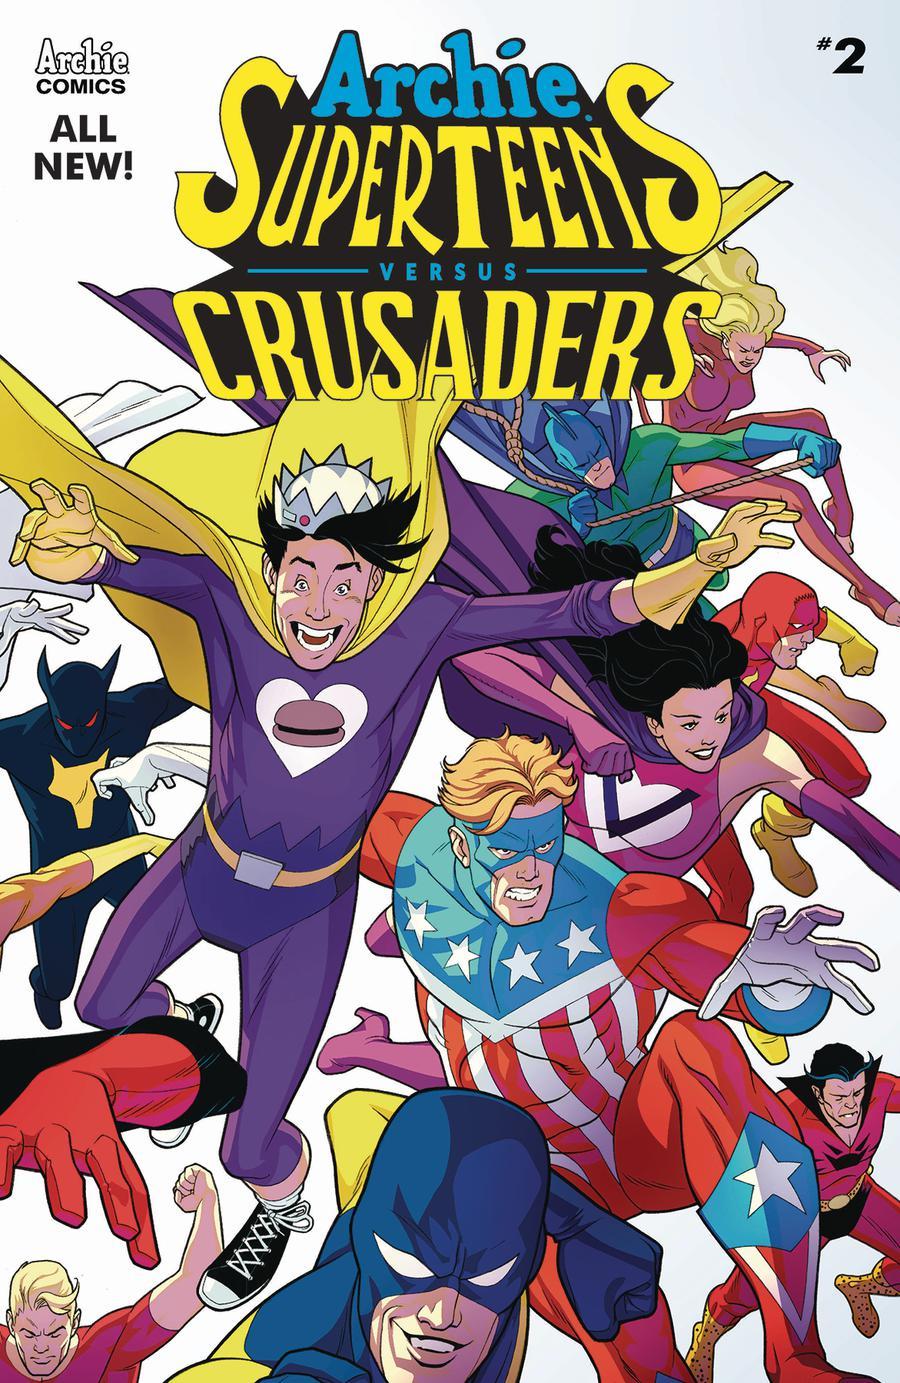 Archie Superteens Versus Crusaders #2 Cover A Regular David Williams Color Cover